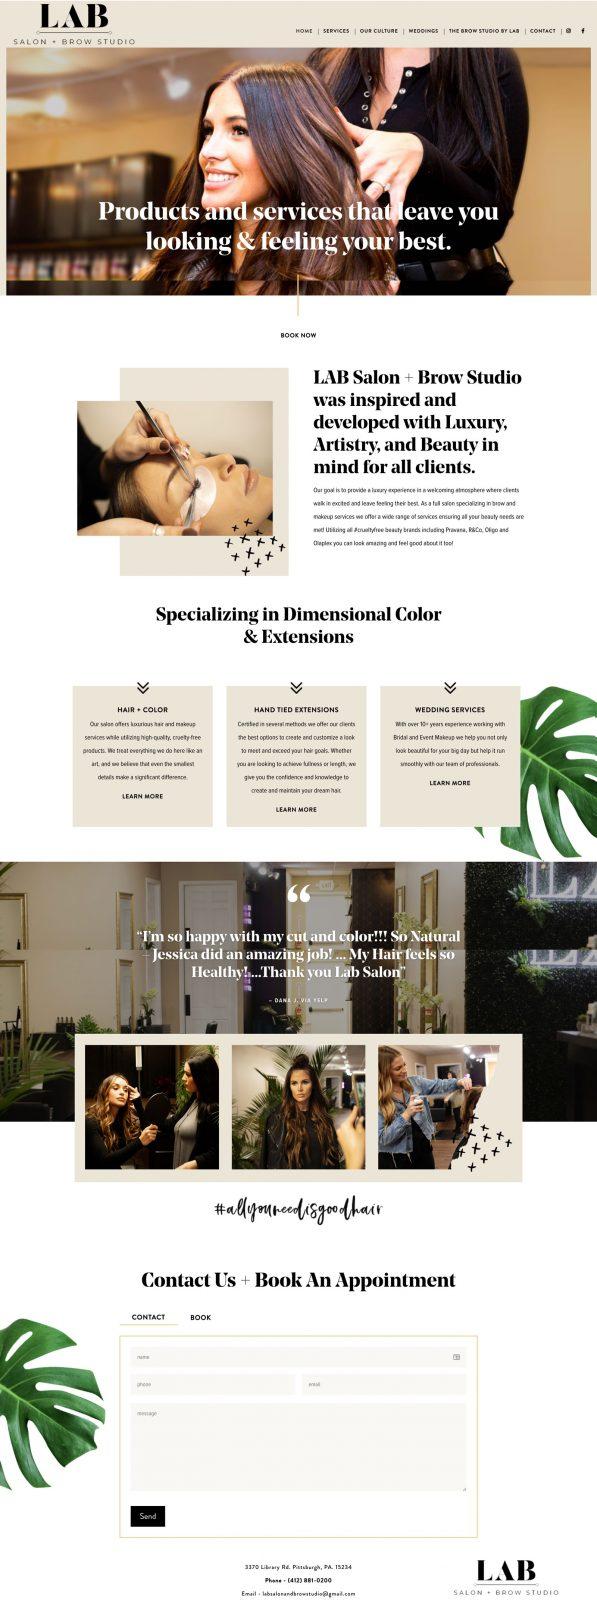 Lab-Salon-Website-Design